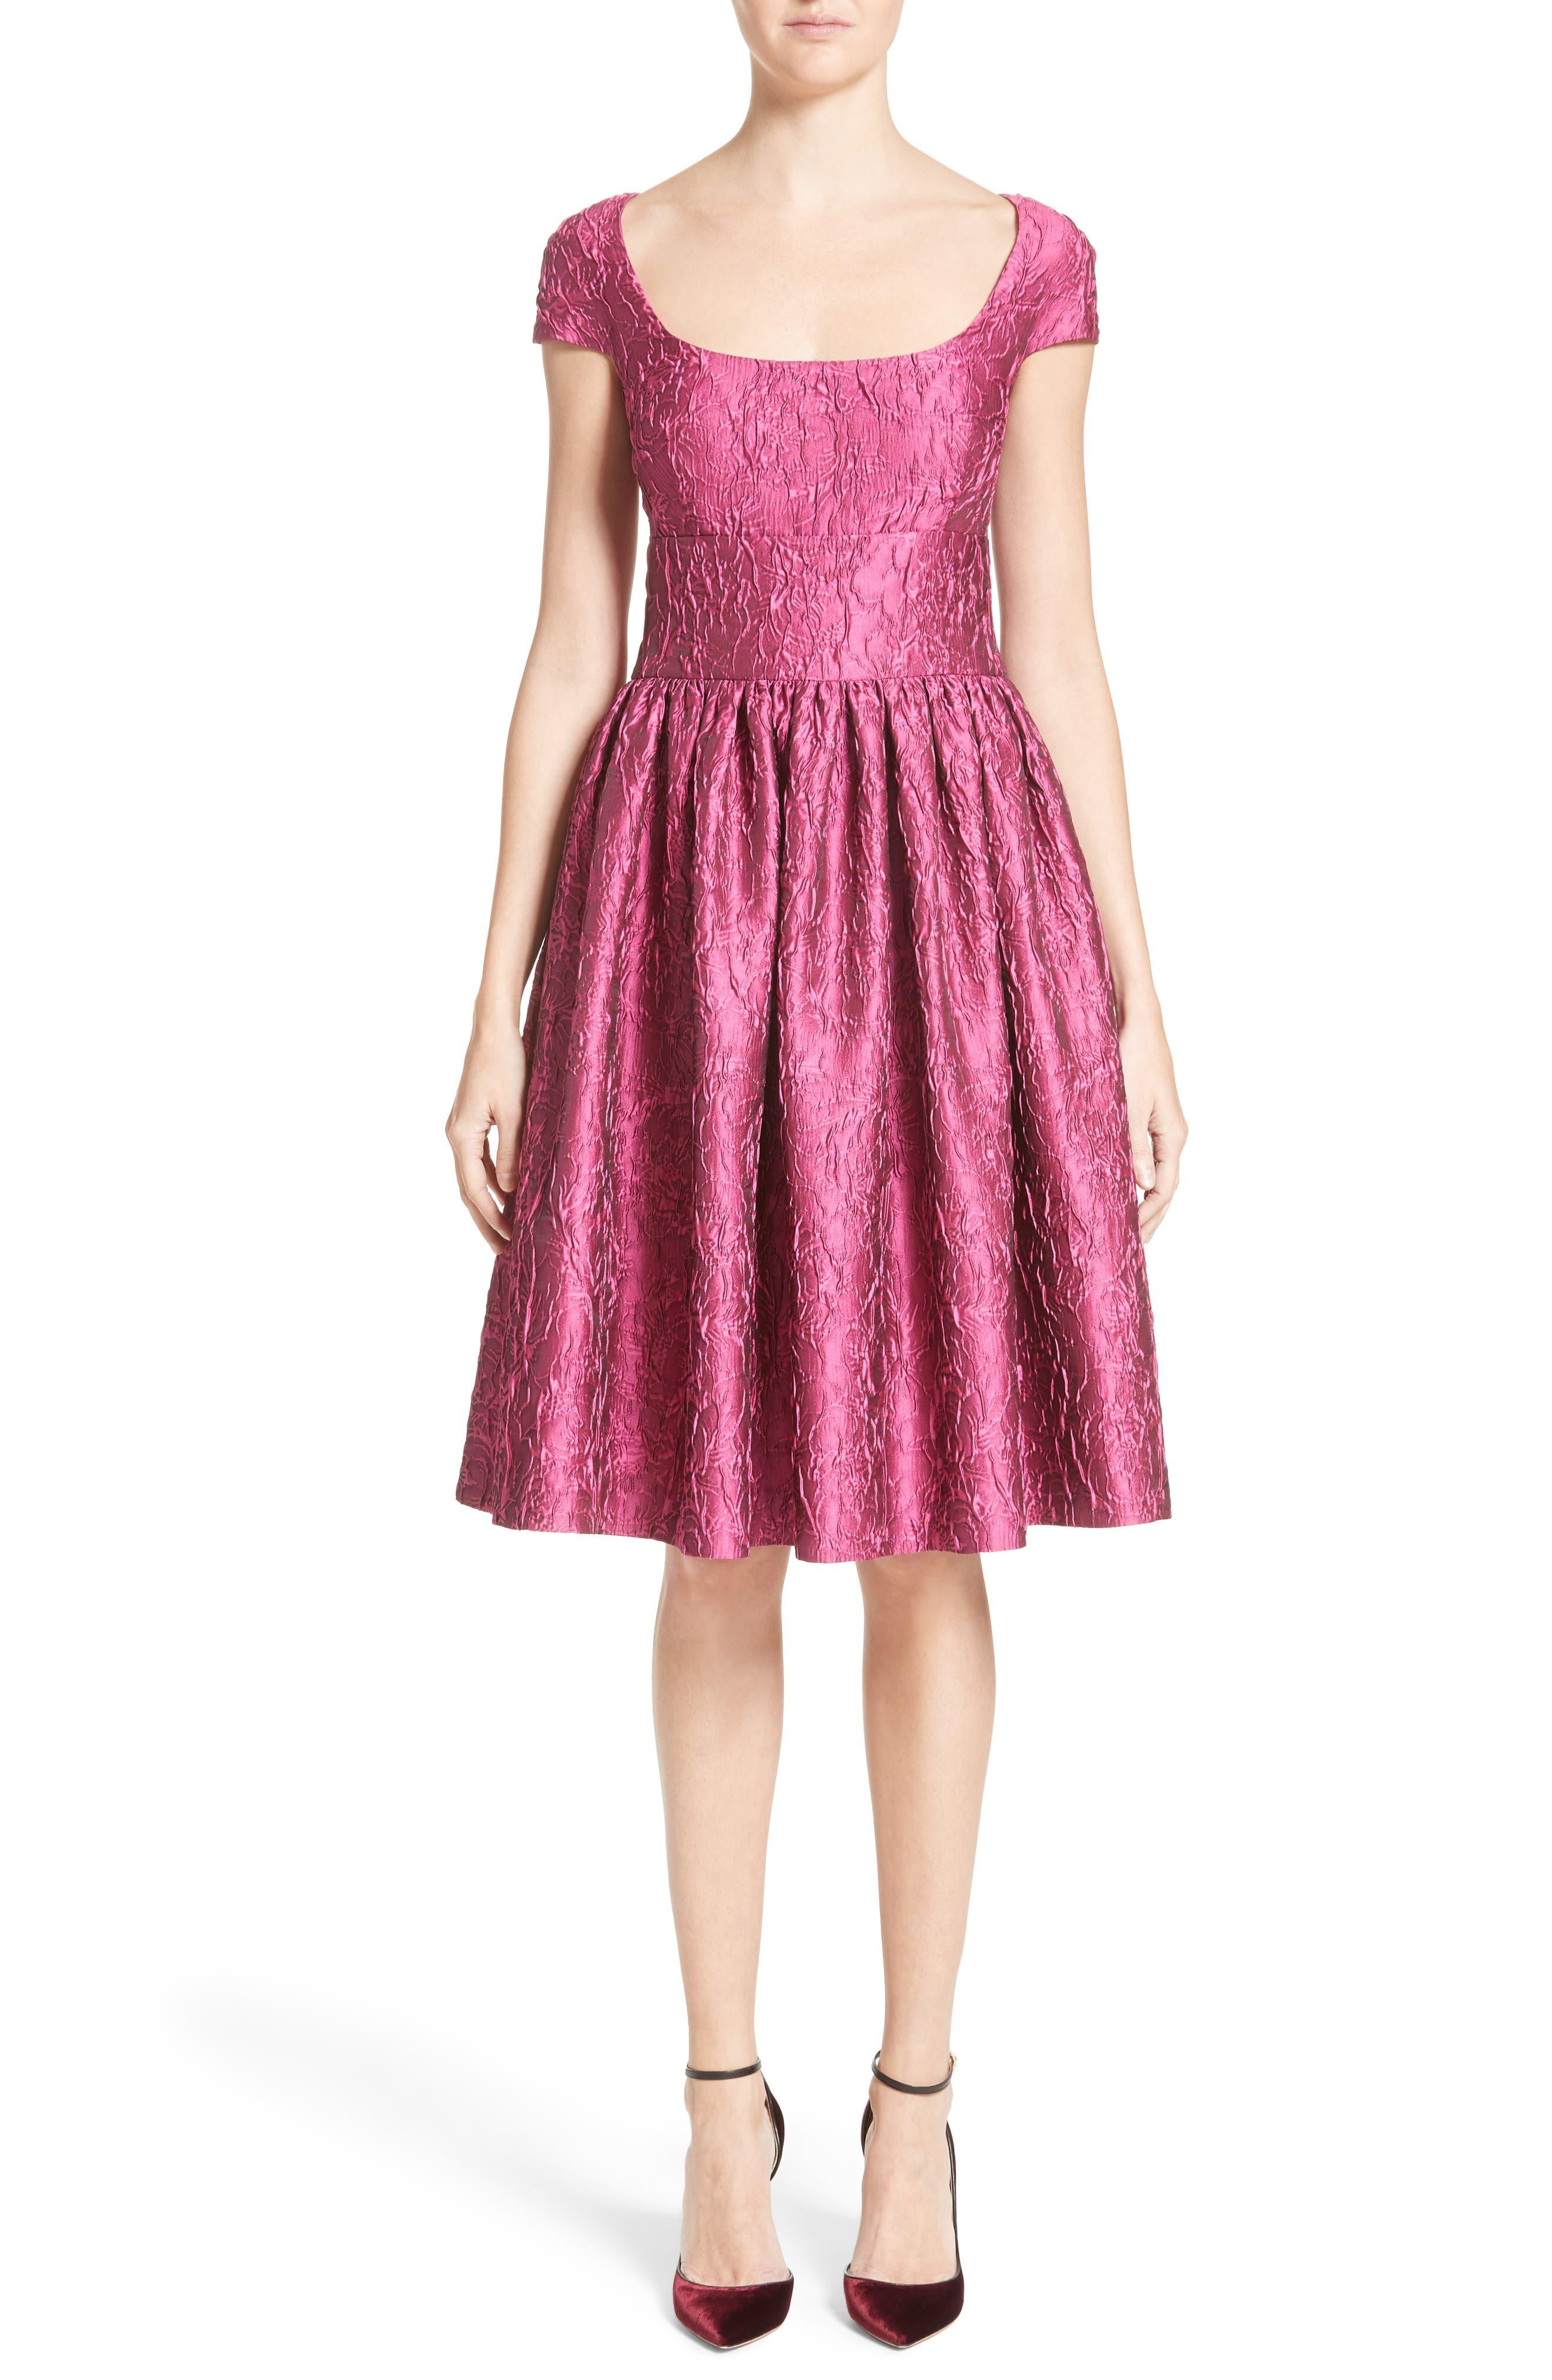 BADGLEY MISCHKA COUTURE. Badgley Mischka Couture Cap Sleeve Brocade Party Dress, Main, color, 652